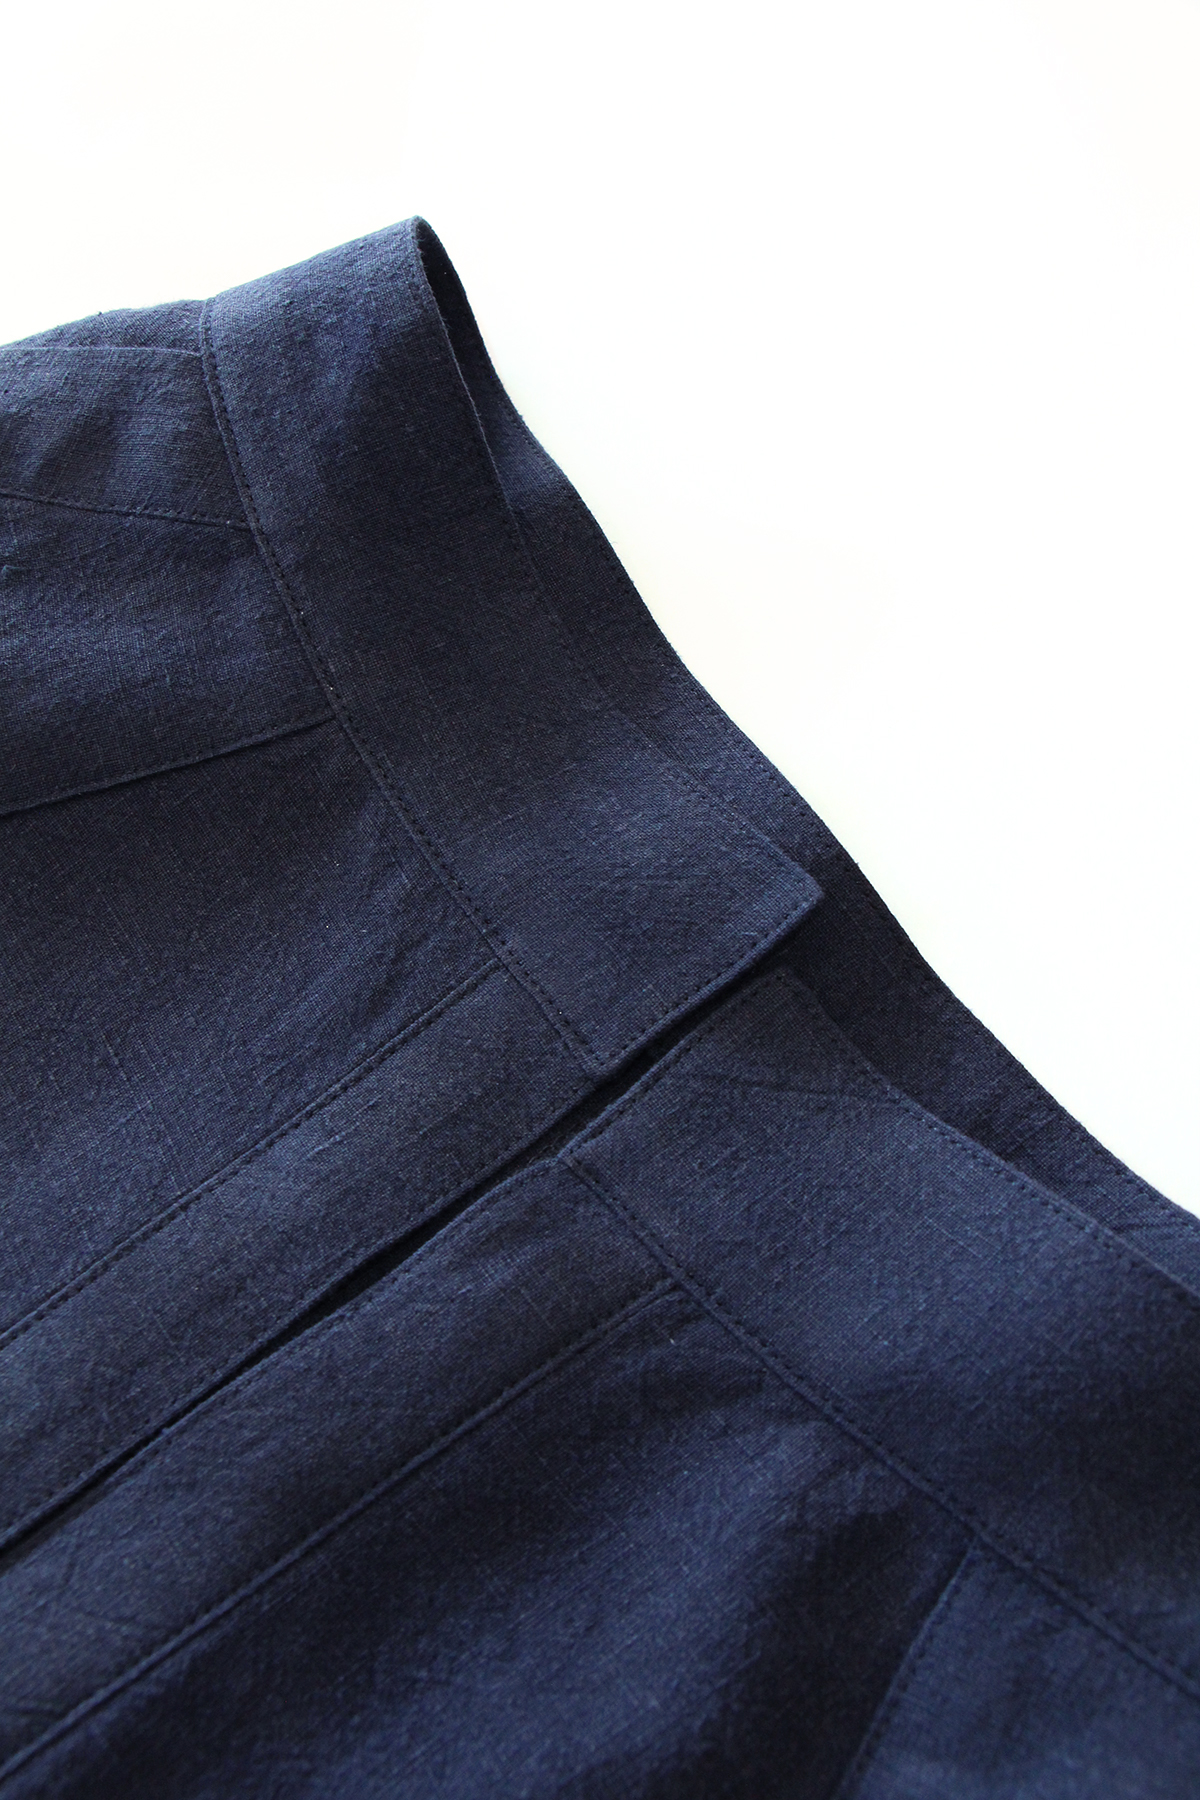 Megan Nielsen Patterns   Matilda Sewalong: Matching Set Hack   Top Stitching Your Skirt Waistband